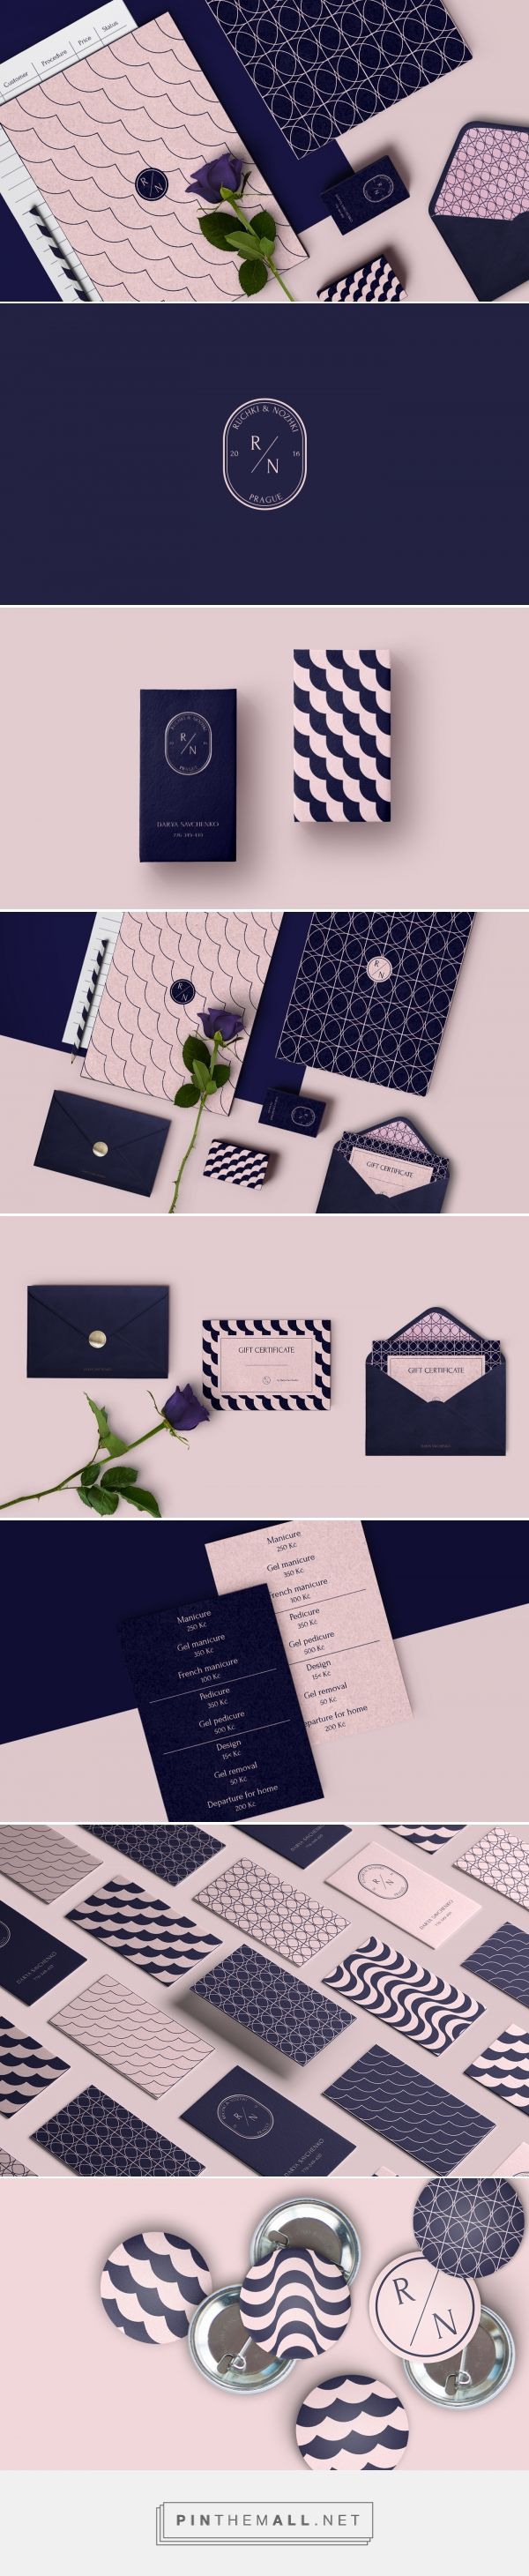 Ruchki Nozhki Nail Spa Branding By Dima Sushko Identity Design Logo Branding Design Inspiration Graphic Design Branding